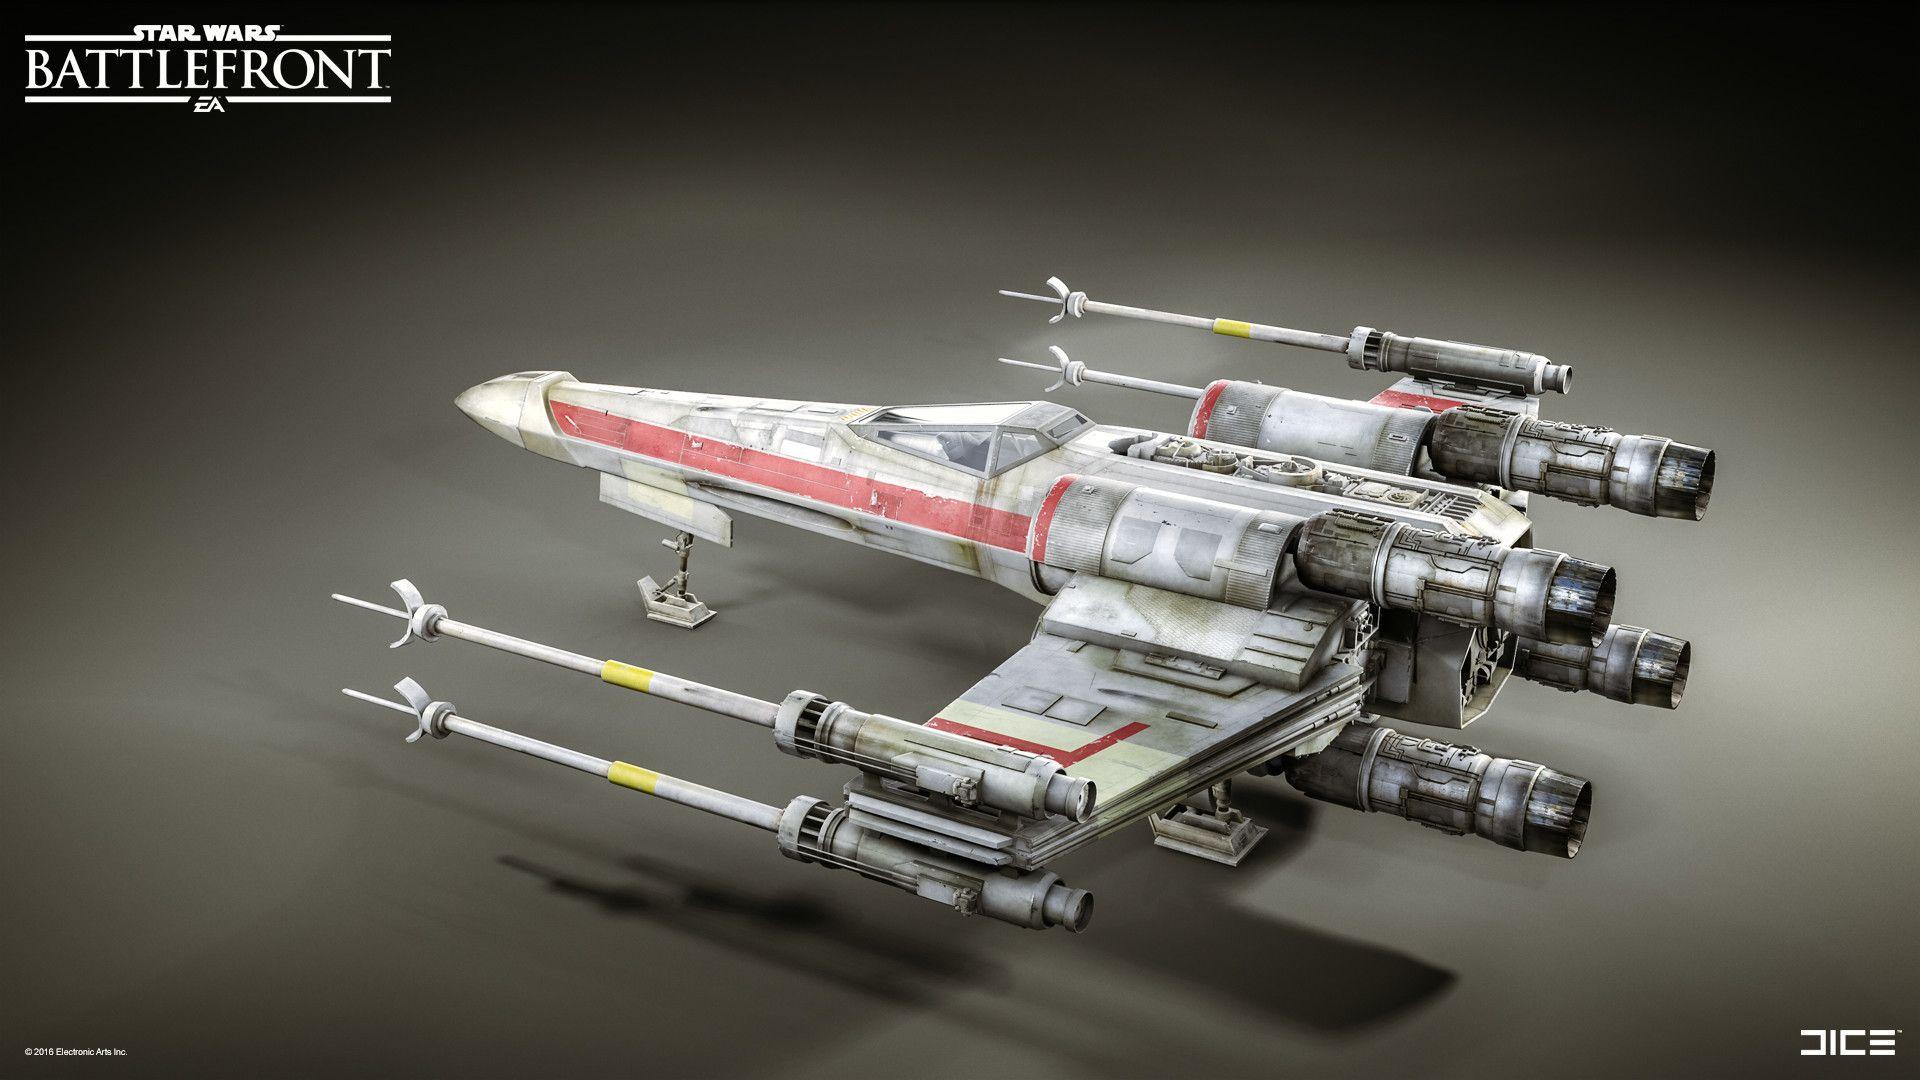 Pin On Star Wars Models